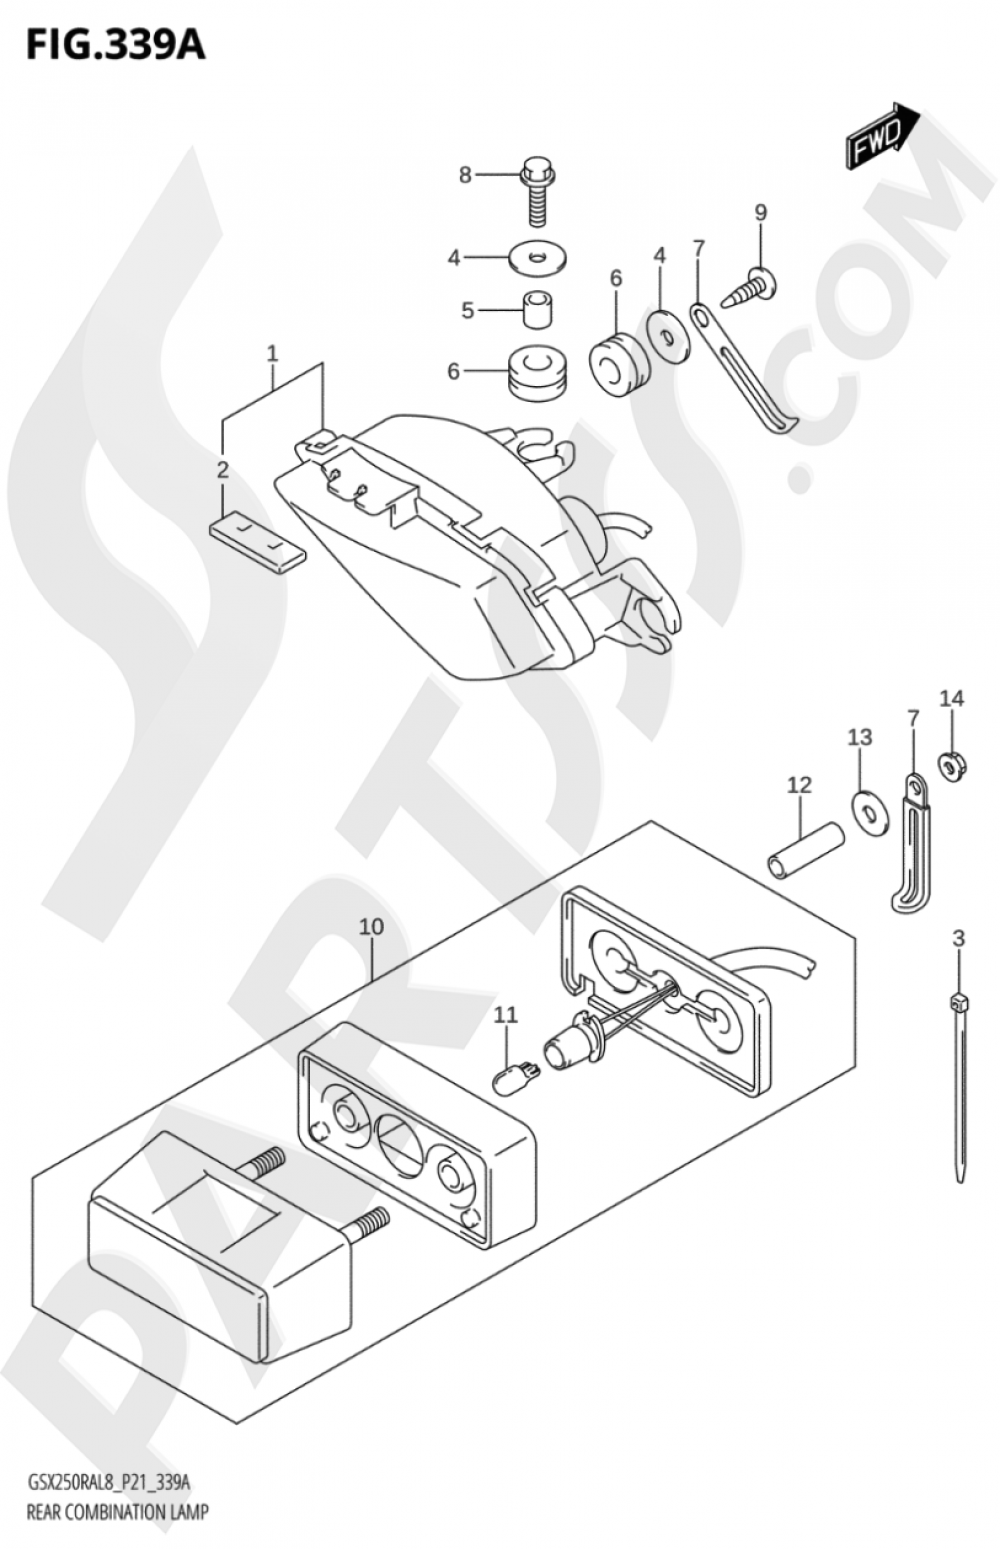 339A - REAR COMBINATION LAMP Suzuki GSX250RZA 2018